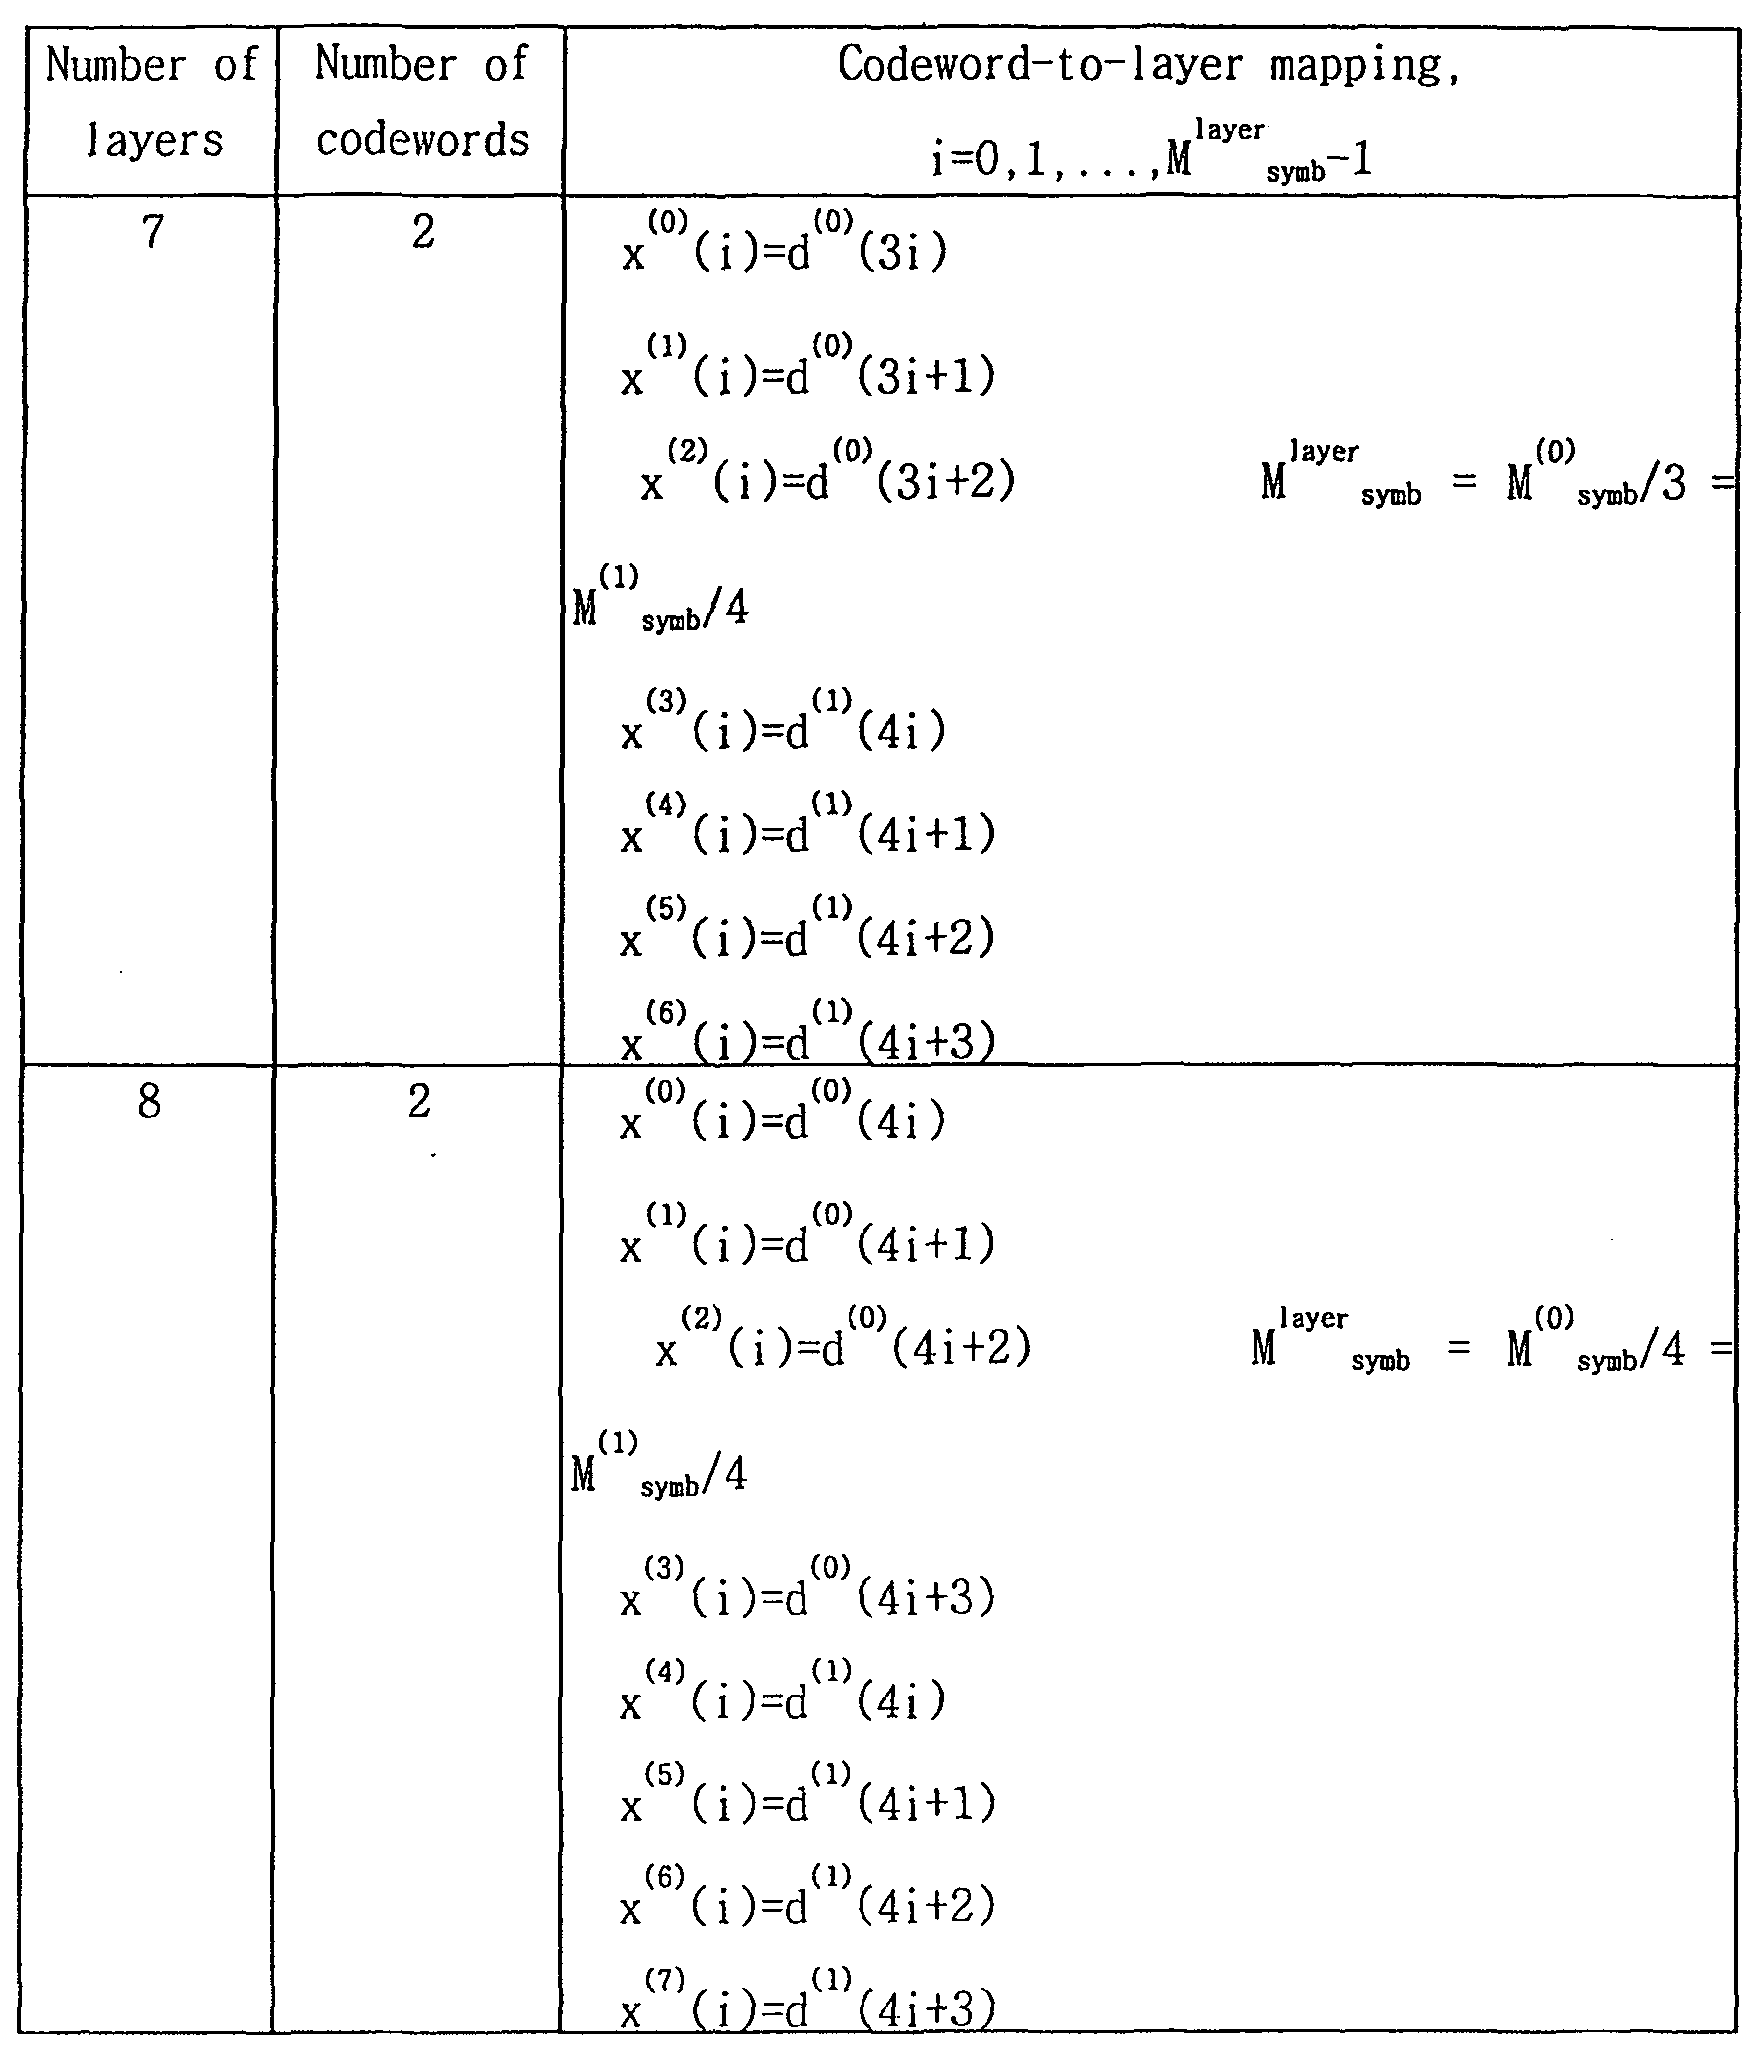 Figure WO-DOC-TABLE-42-2